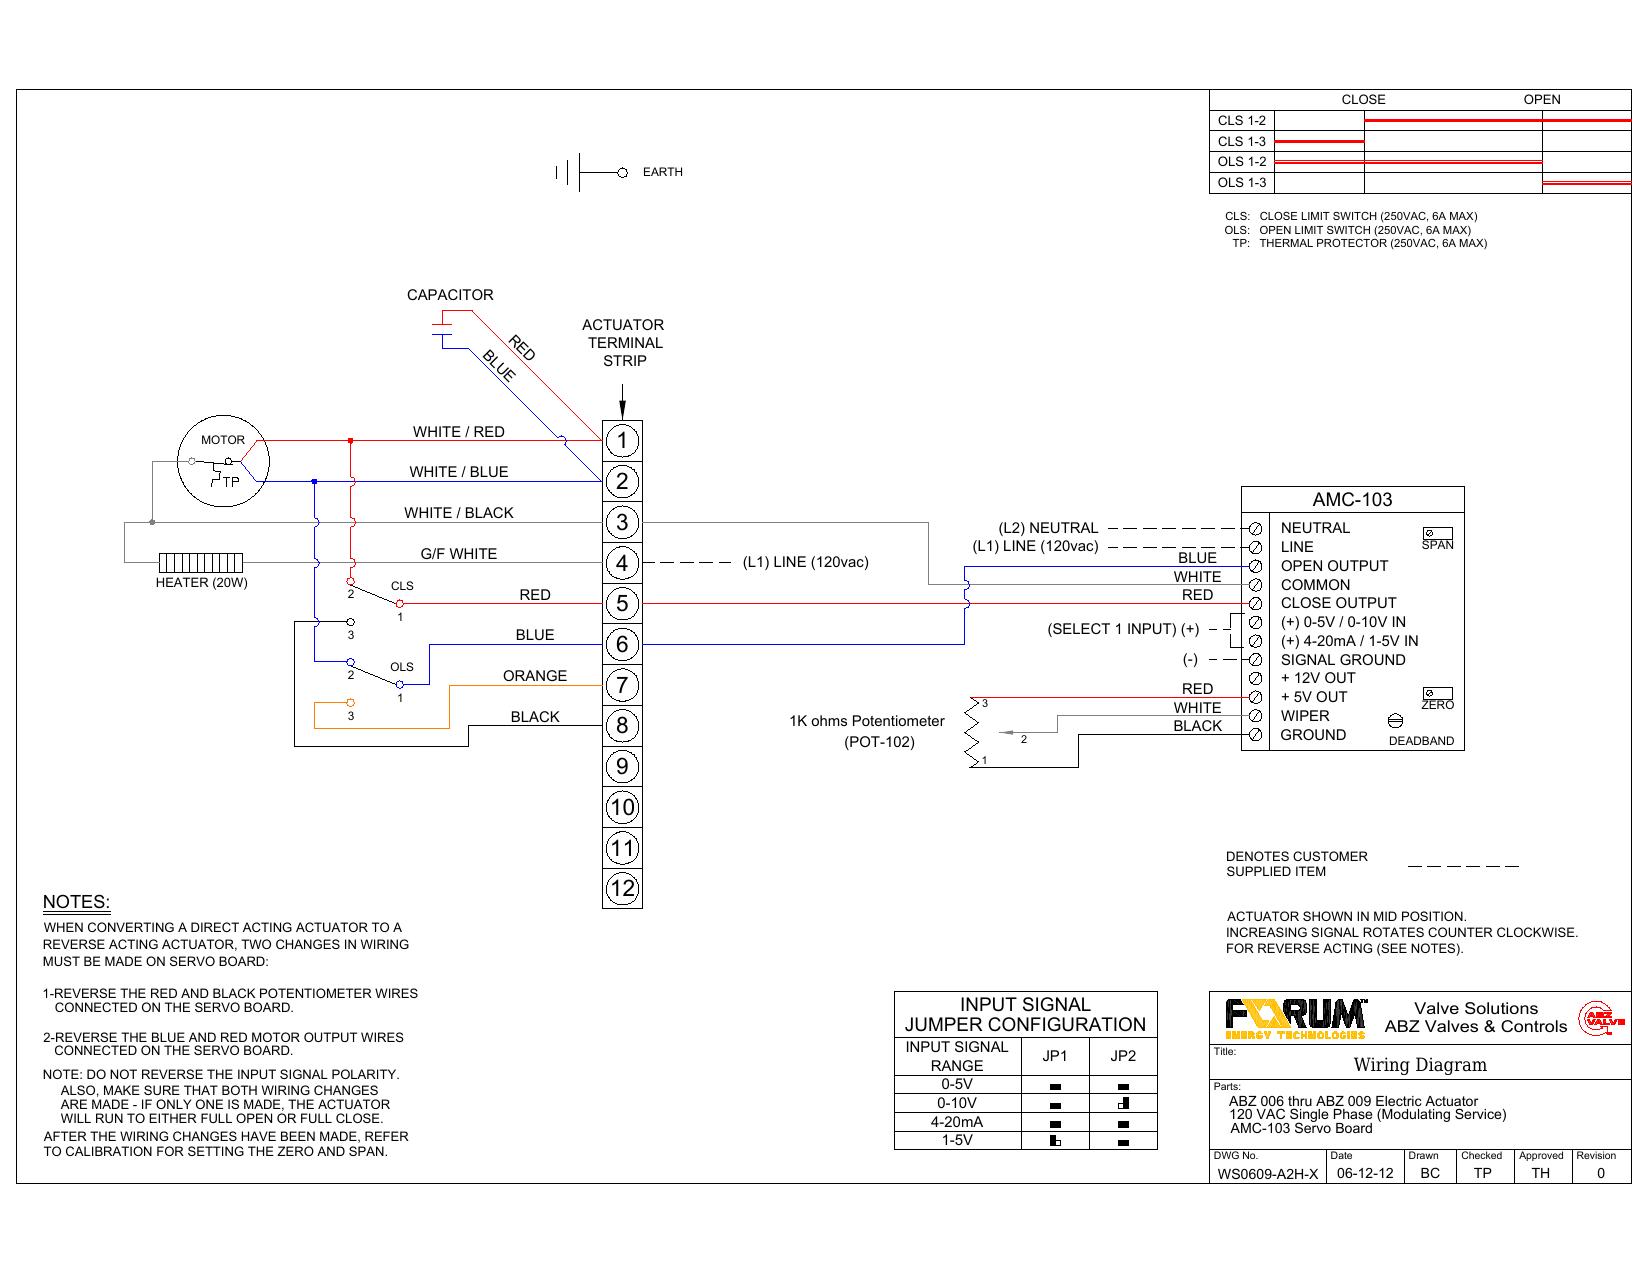 Abz Valve Wiring Diagram Ws0609 on